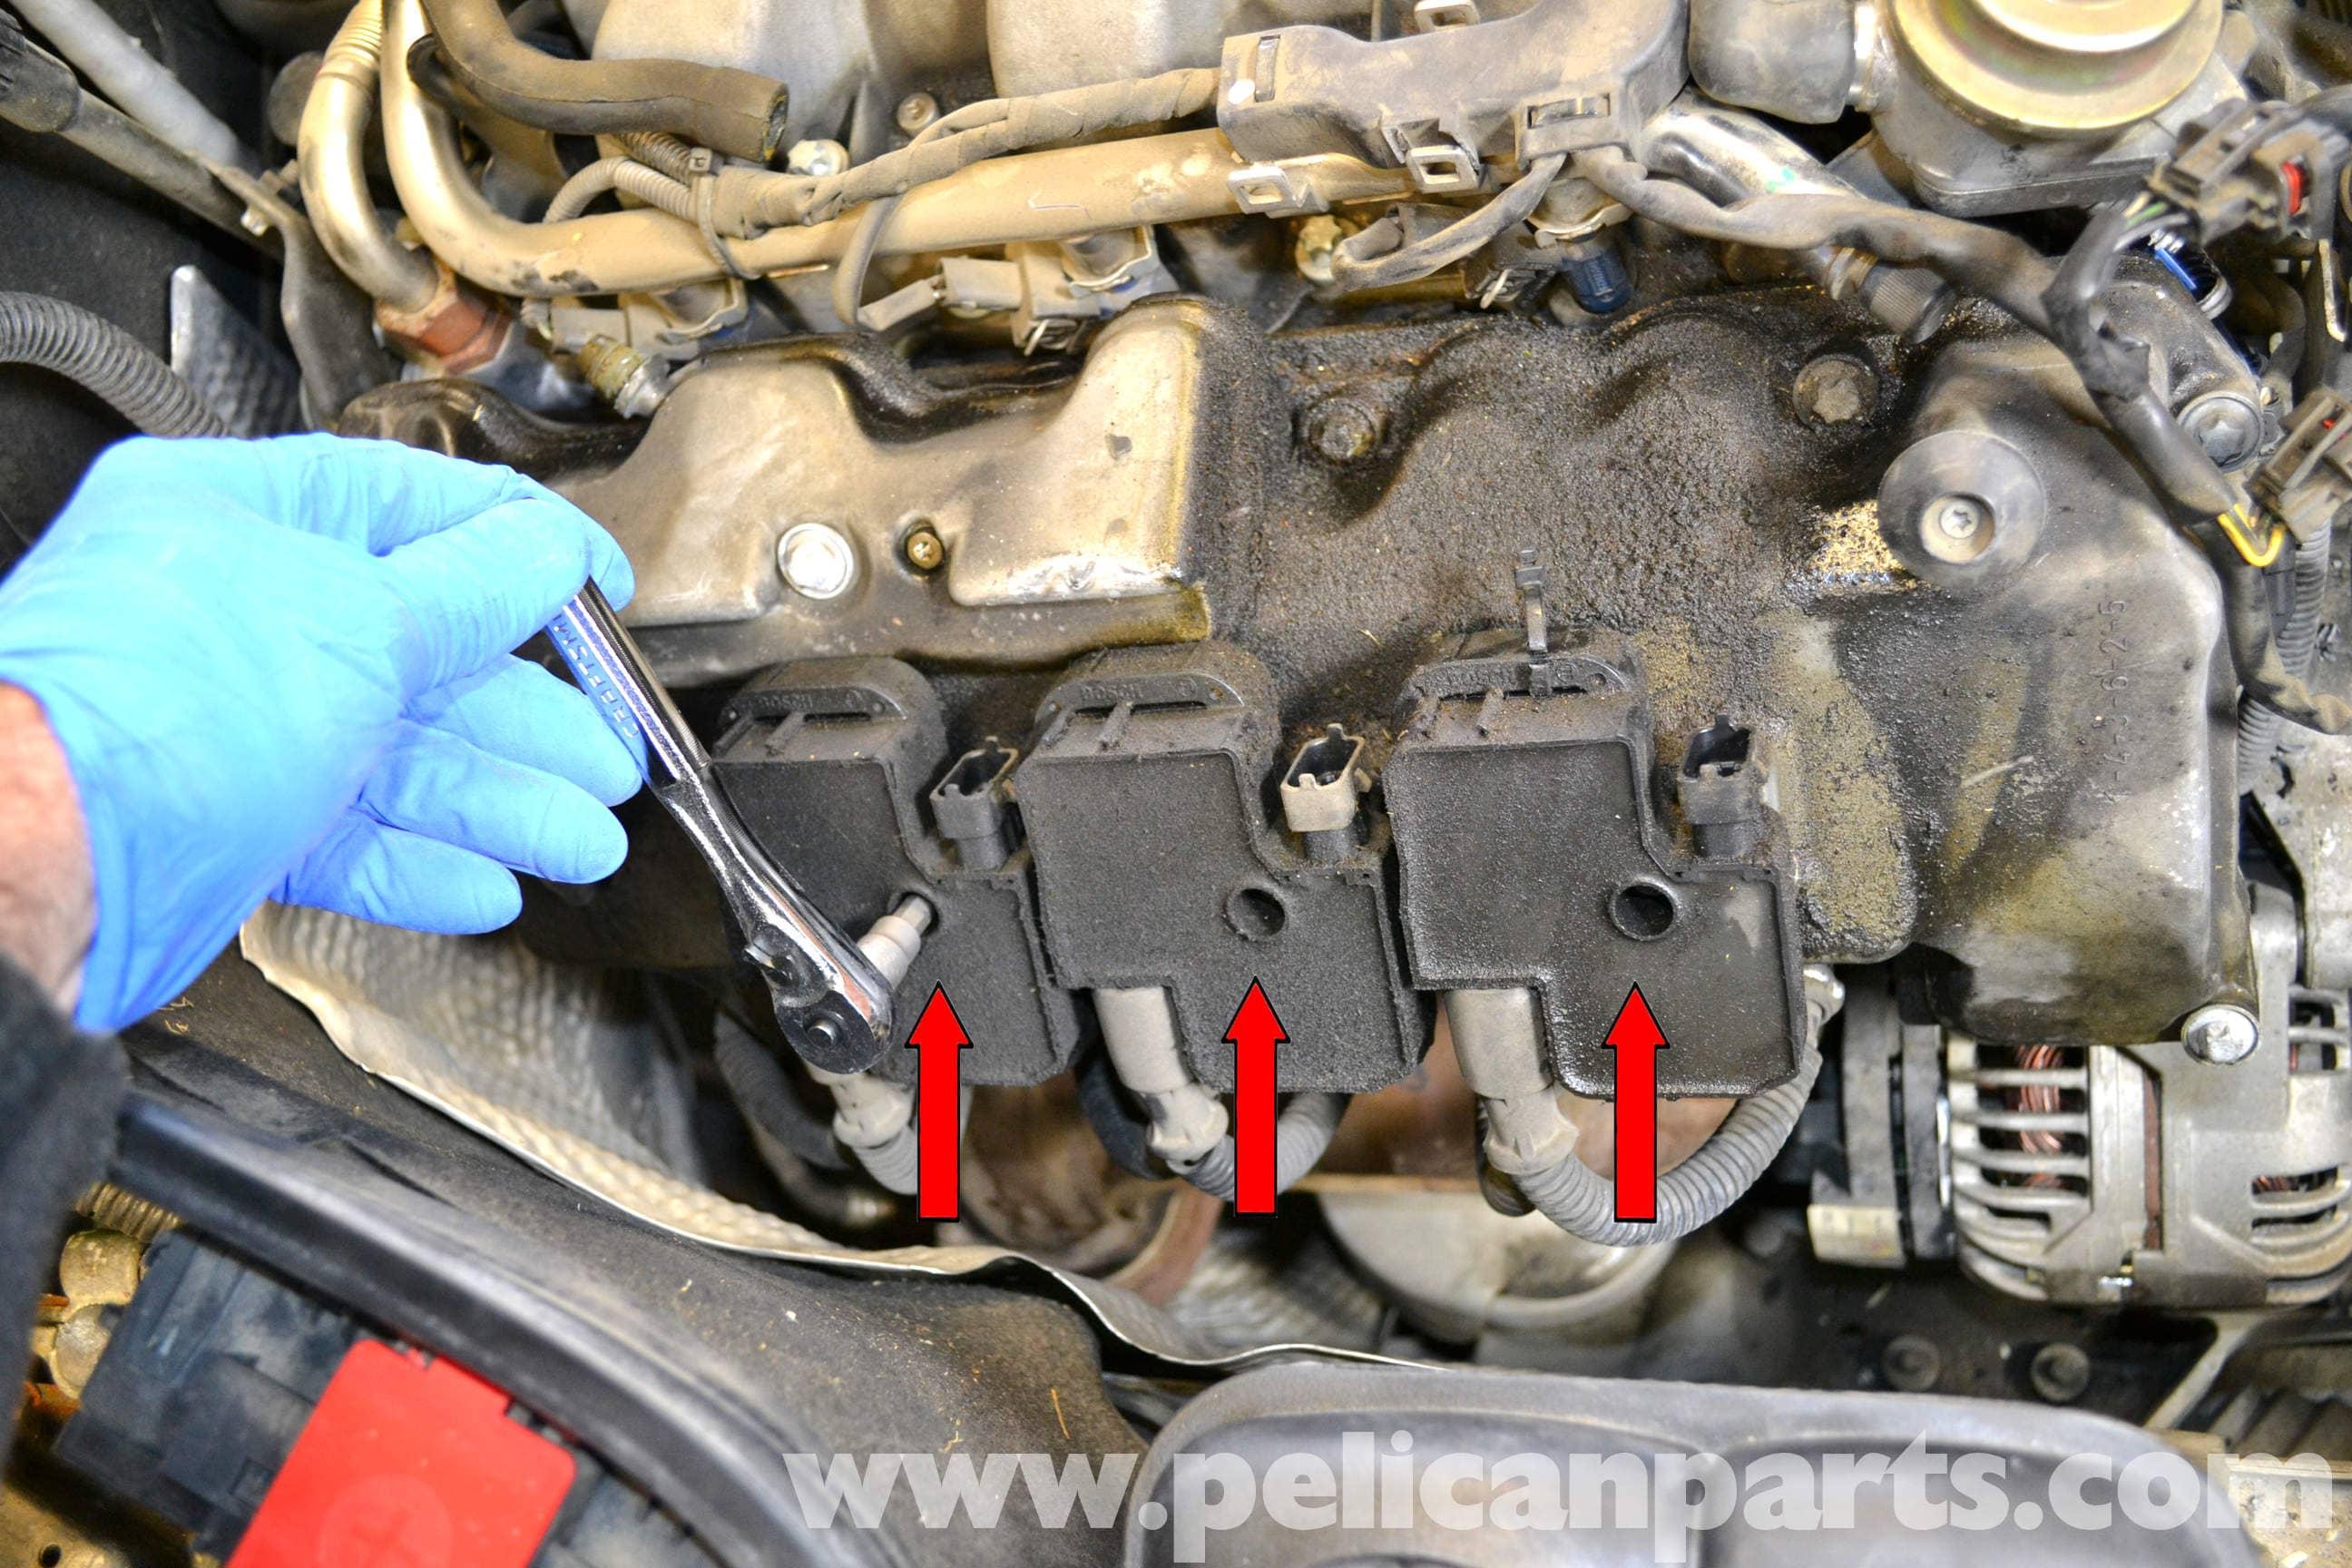 Mercedes Benz Coil Pack Wiring Diagrams C180 Diagram C230 Engine Enthusiast U2022 Rh Rasalibre Co A160